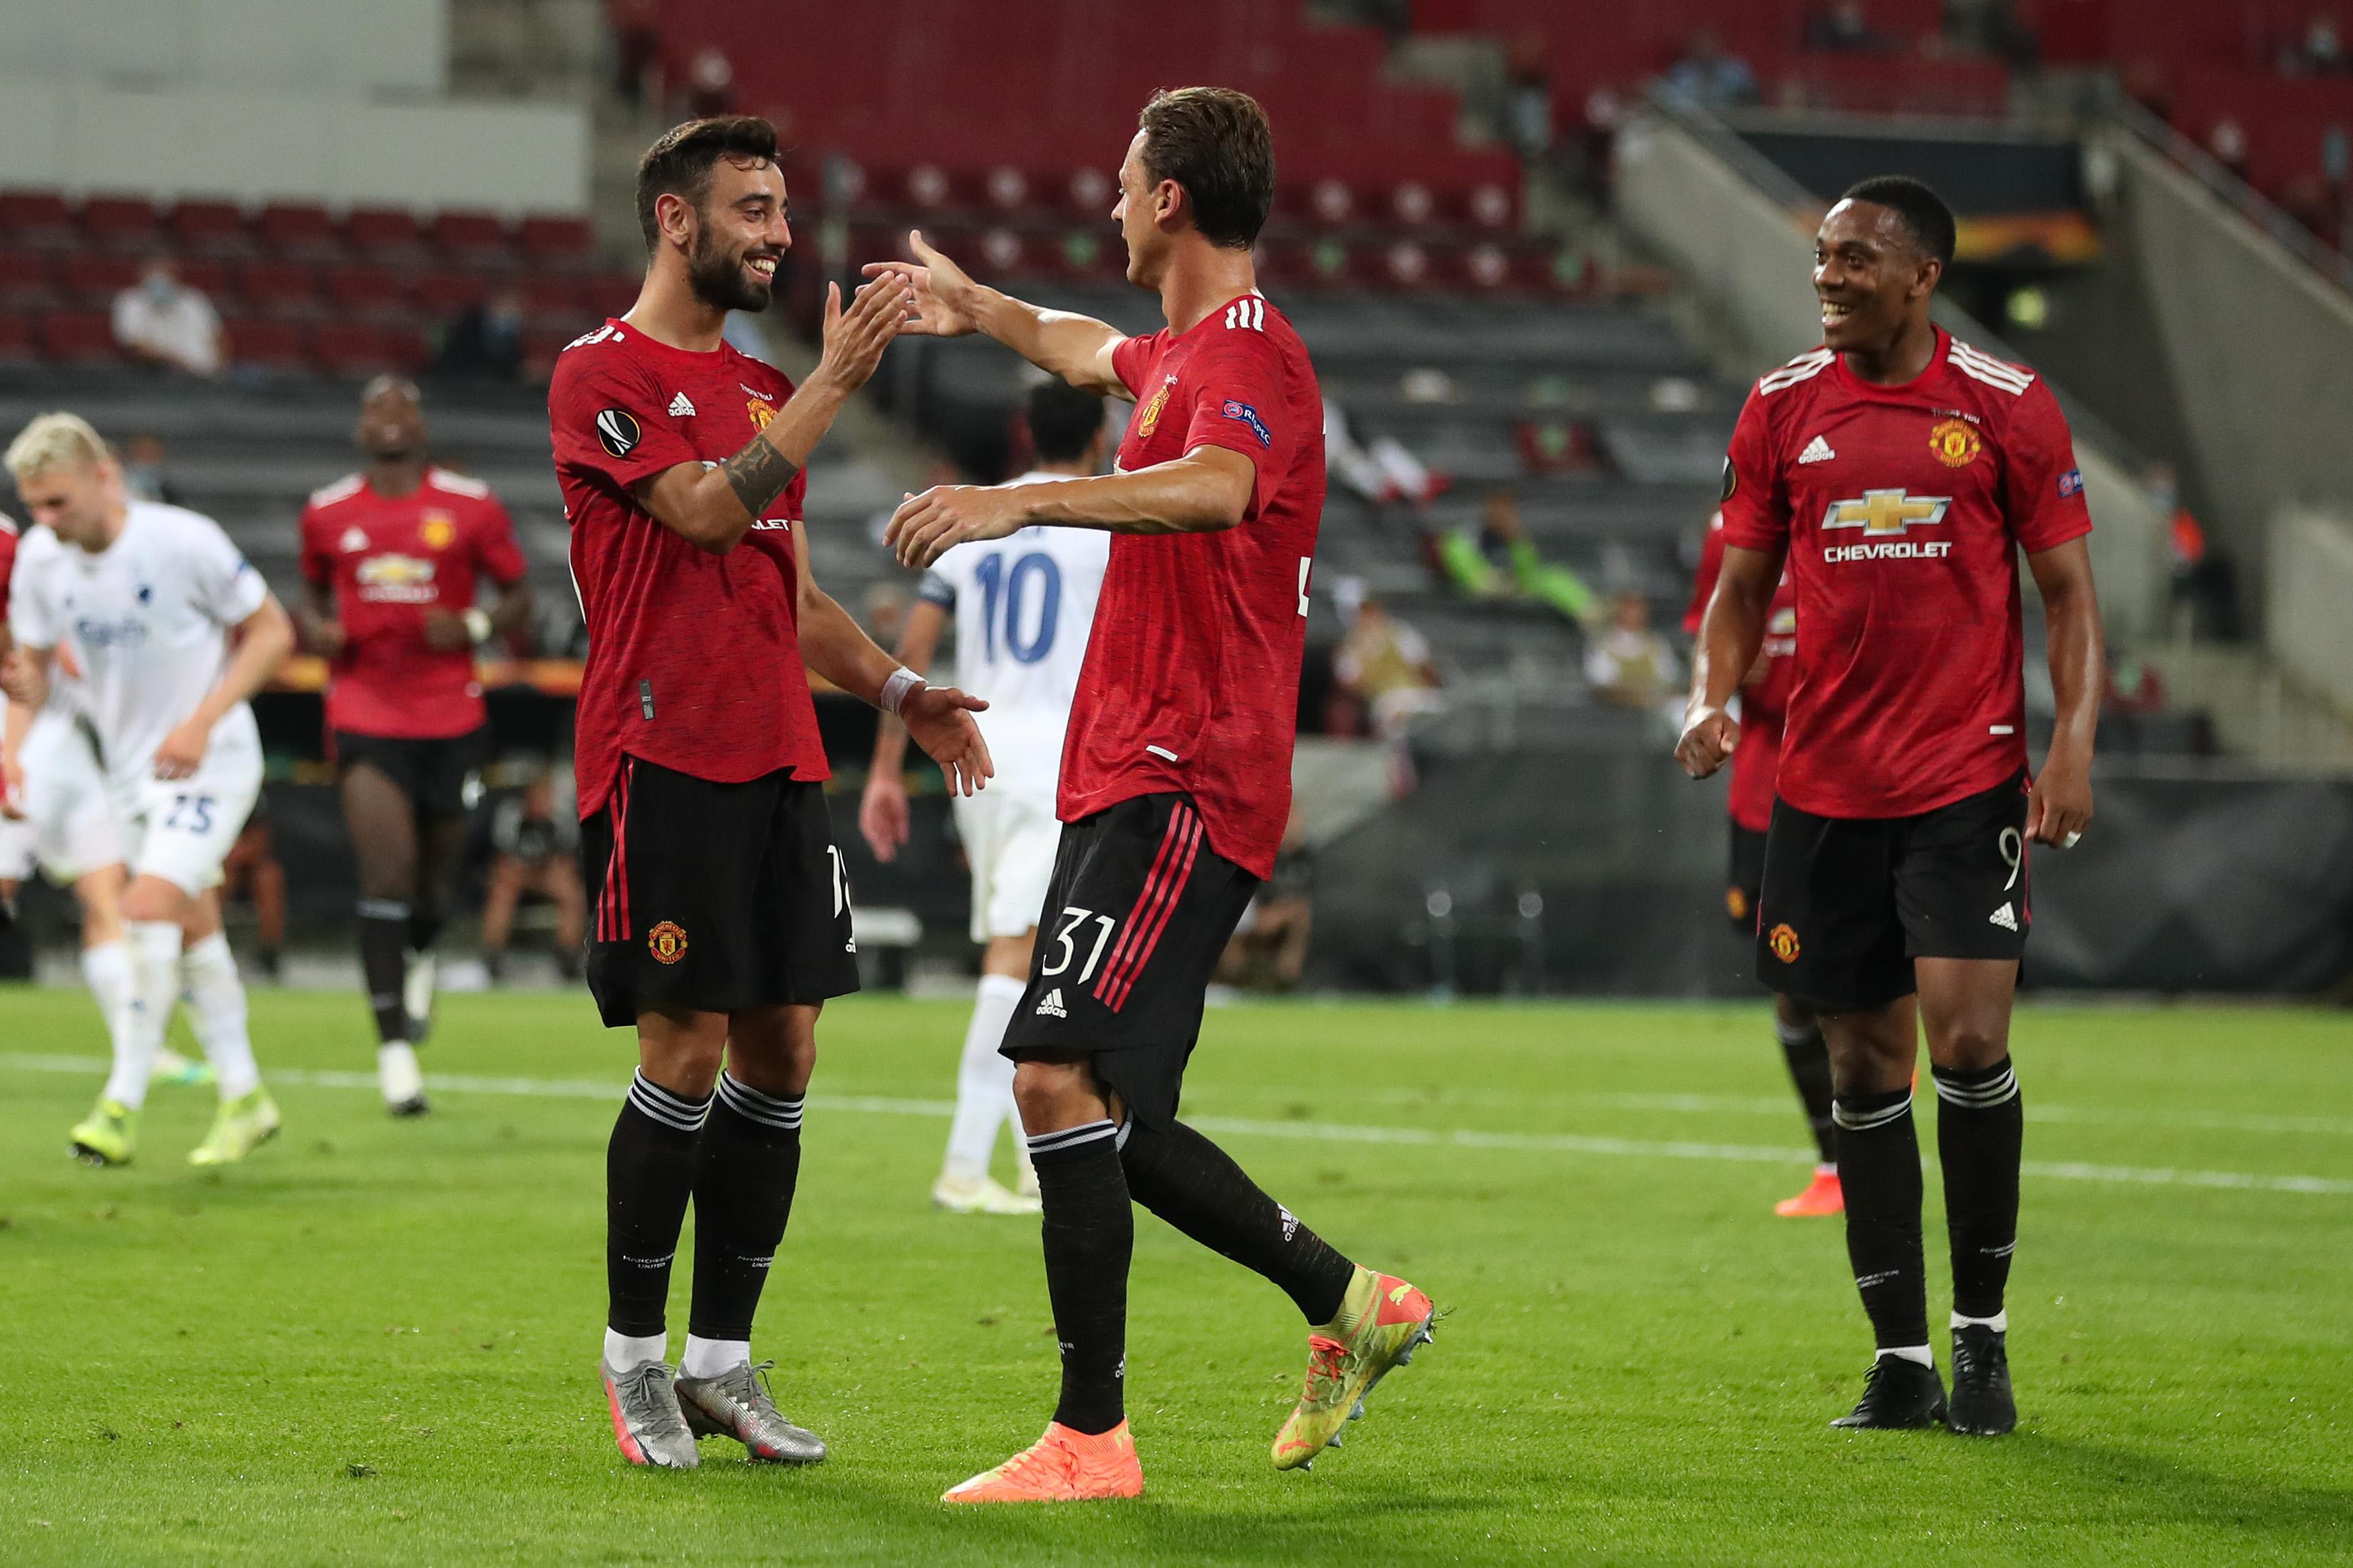 Manchester United v Sevilla LIVE commentary: Confirm team news as Ole Gunnar Solskjaer drops De Gea for thumbnail